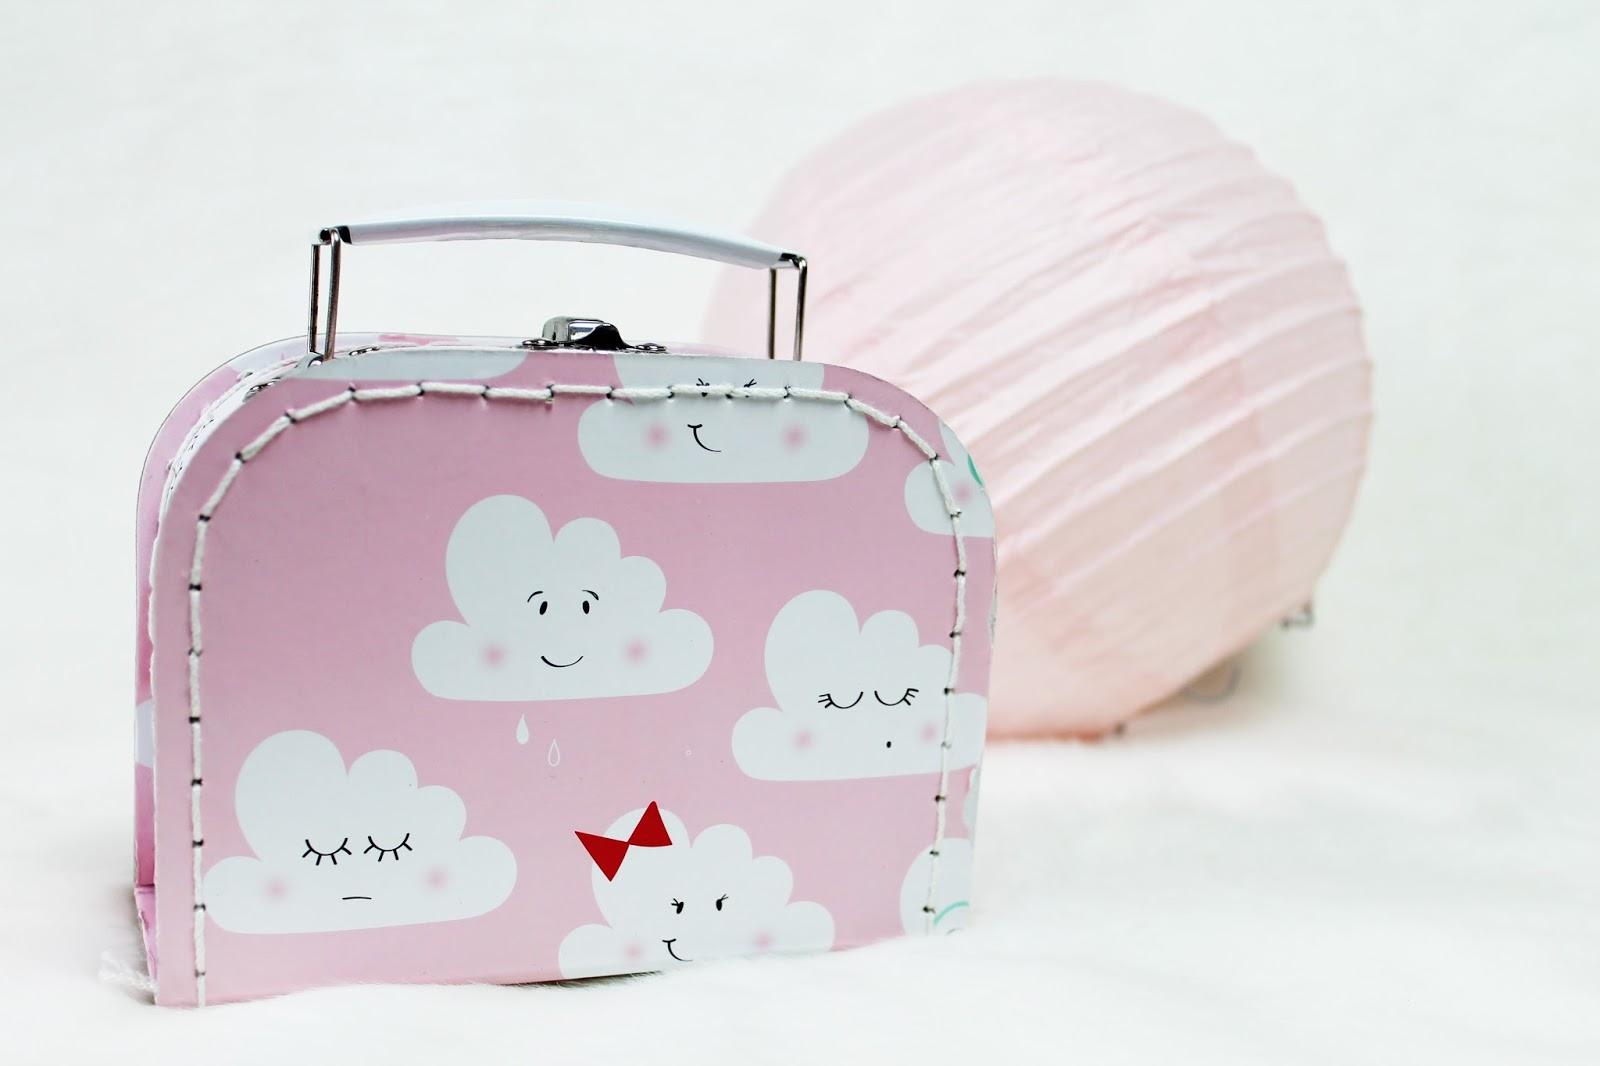 soeurs Sostrene Grene du danemark la défense paris valise valisette rose nuage carton lampion